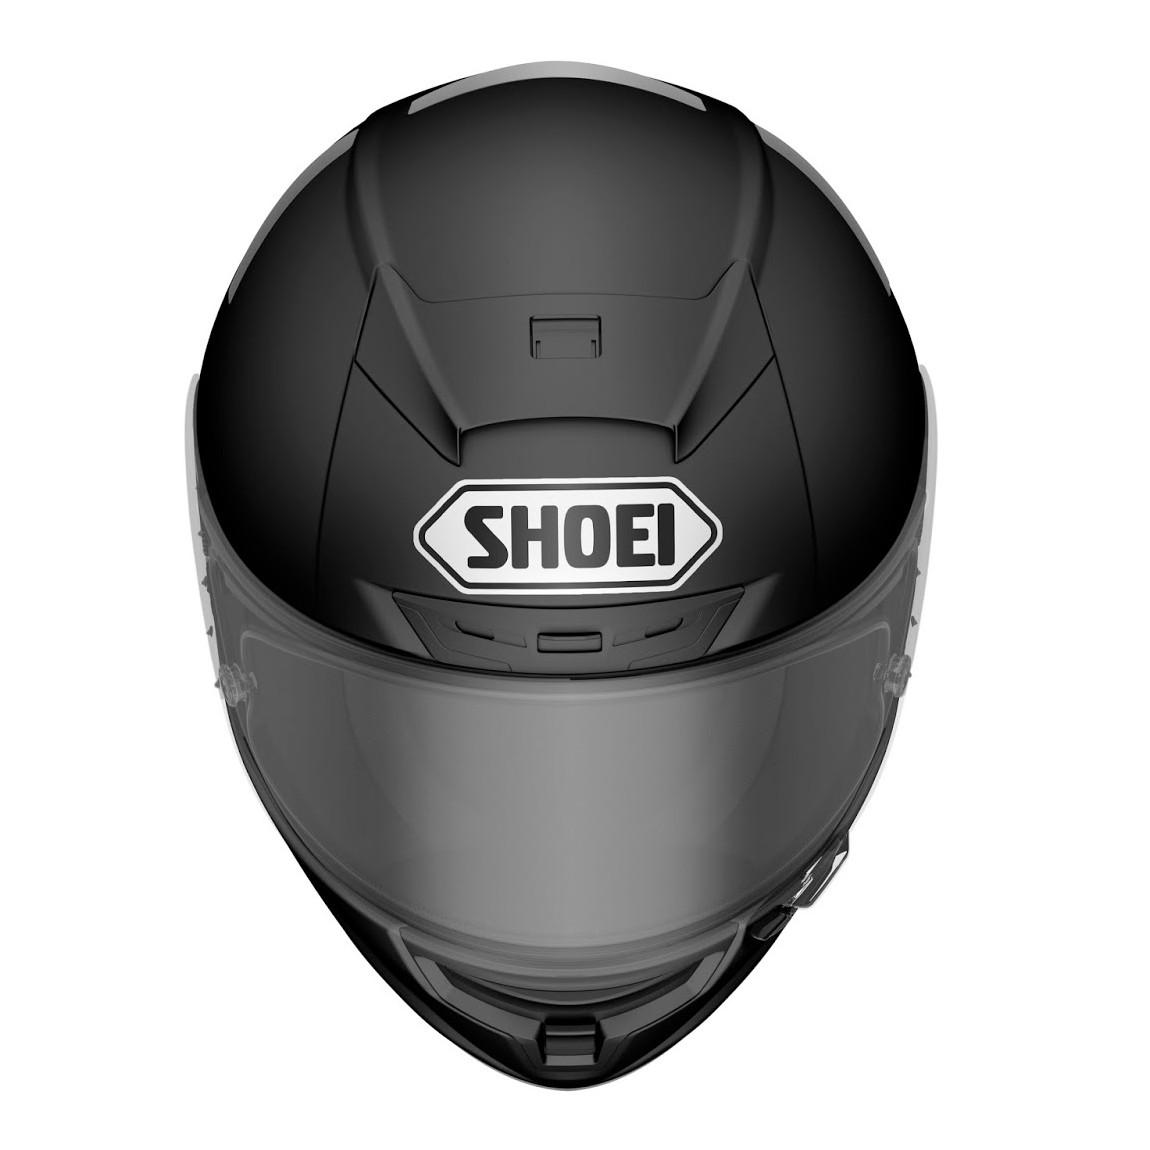 Capacete Shoei X-Spirit 3 Preto Fosco   - Planet Bike Shop Moto Acessórios